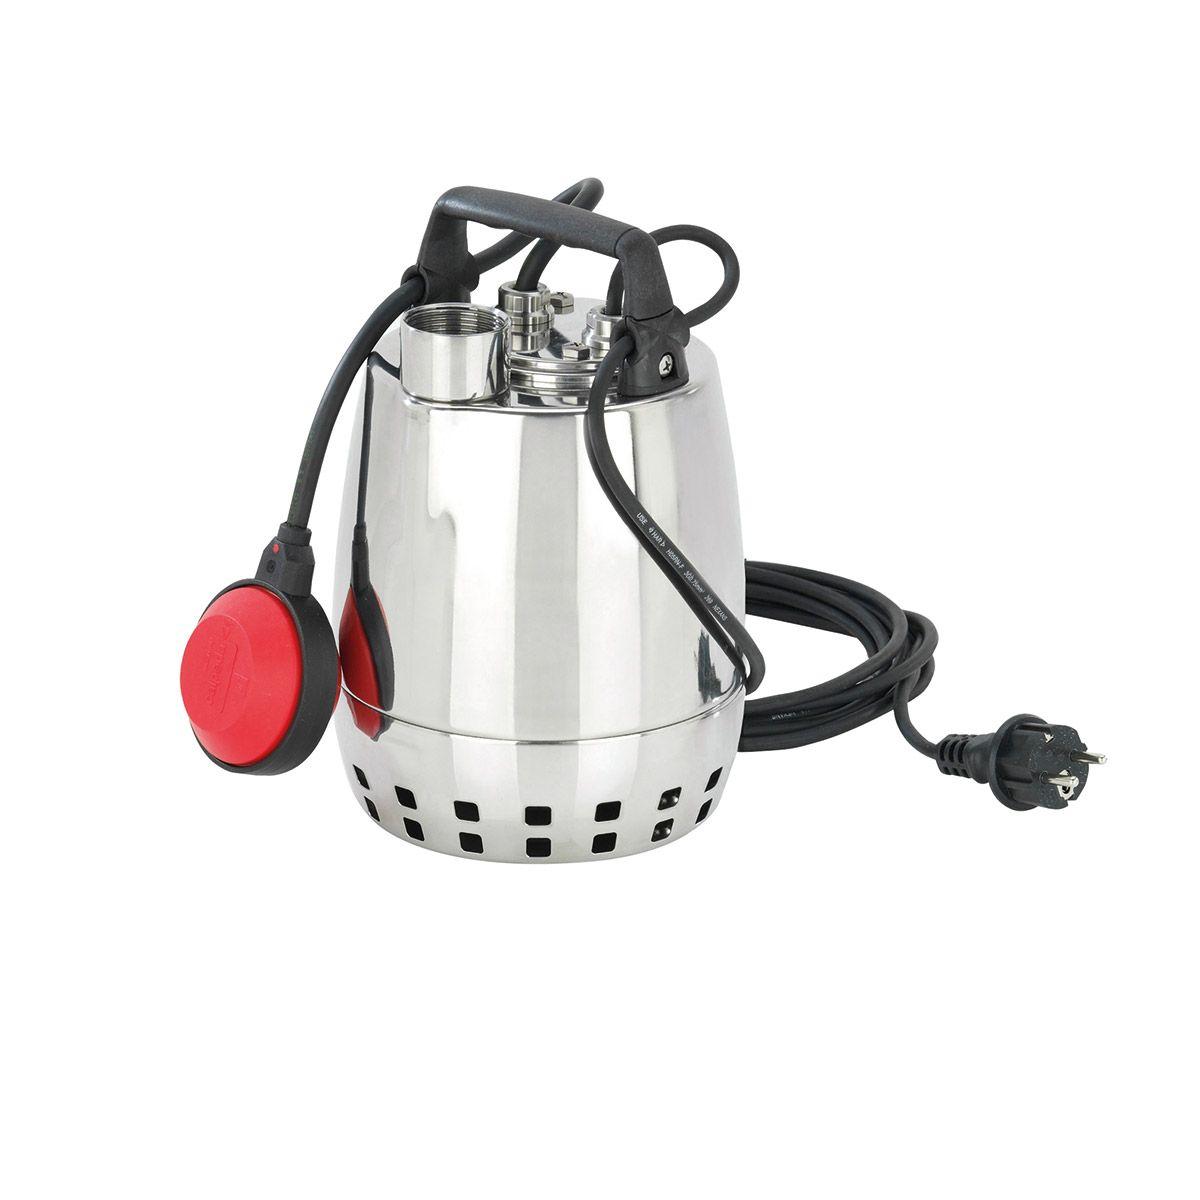 Pompe à eaux usées GXRM 9, H max. 9m, Q max. 10000l/h, 0,50kW, D 176 x 265 mm